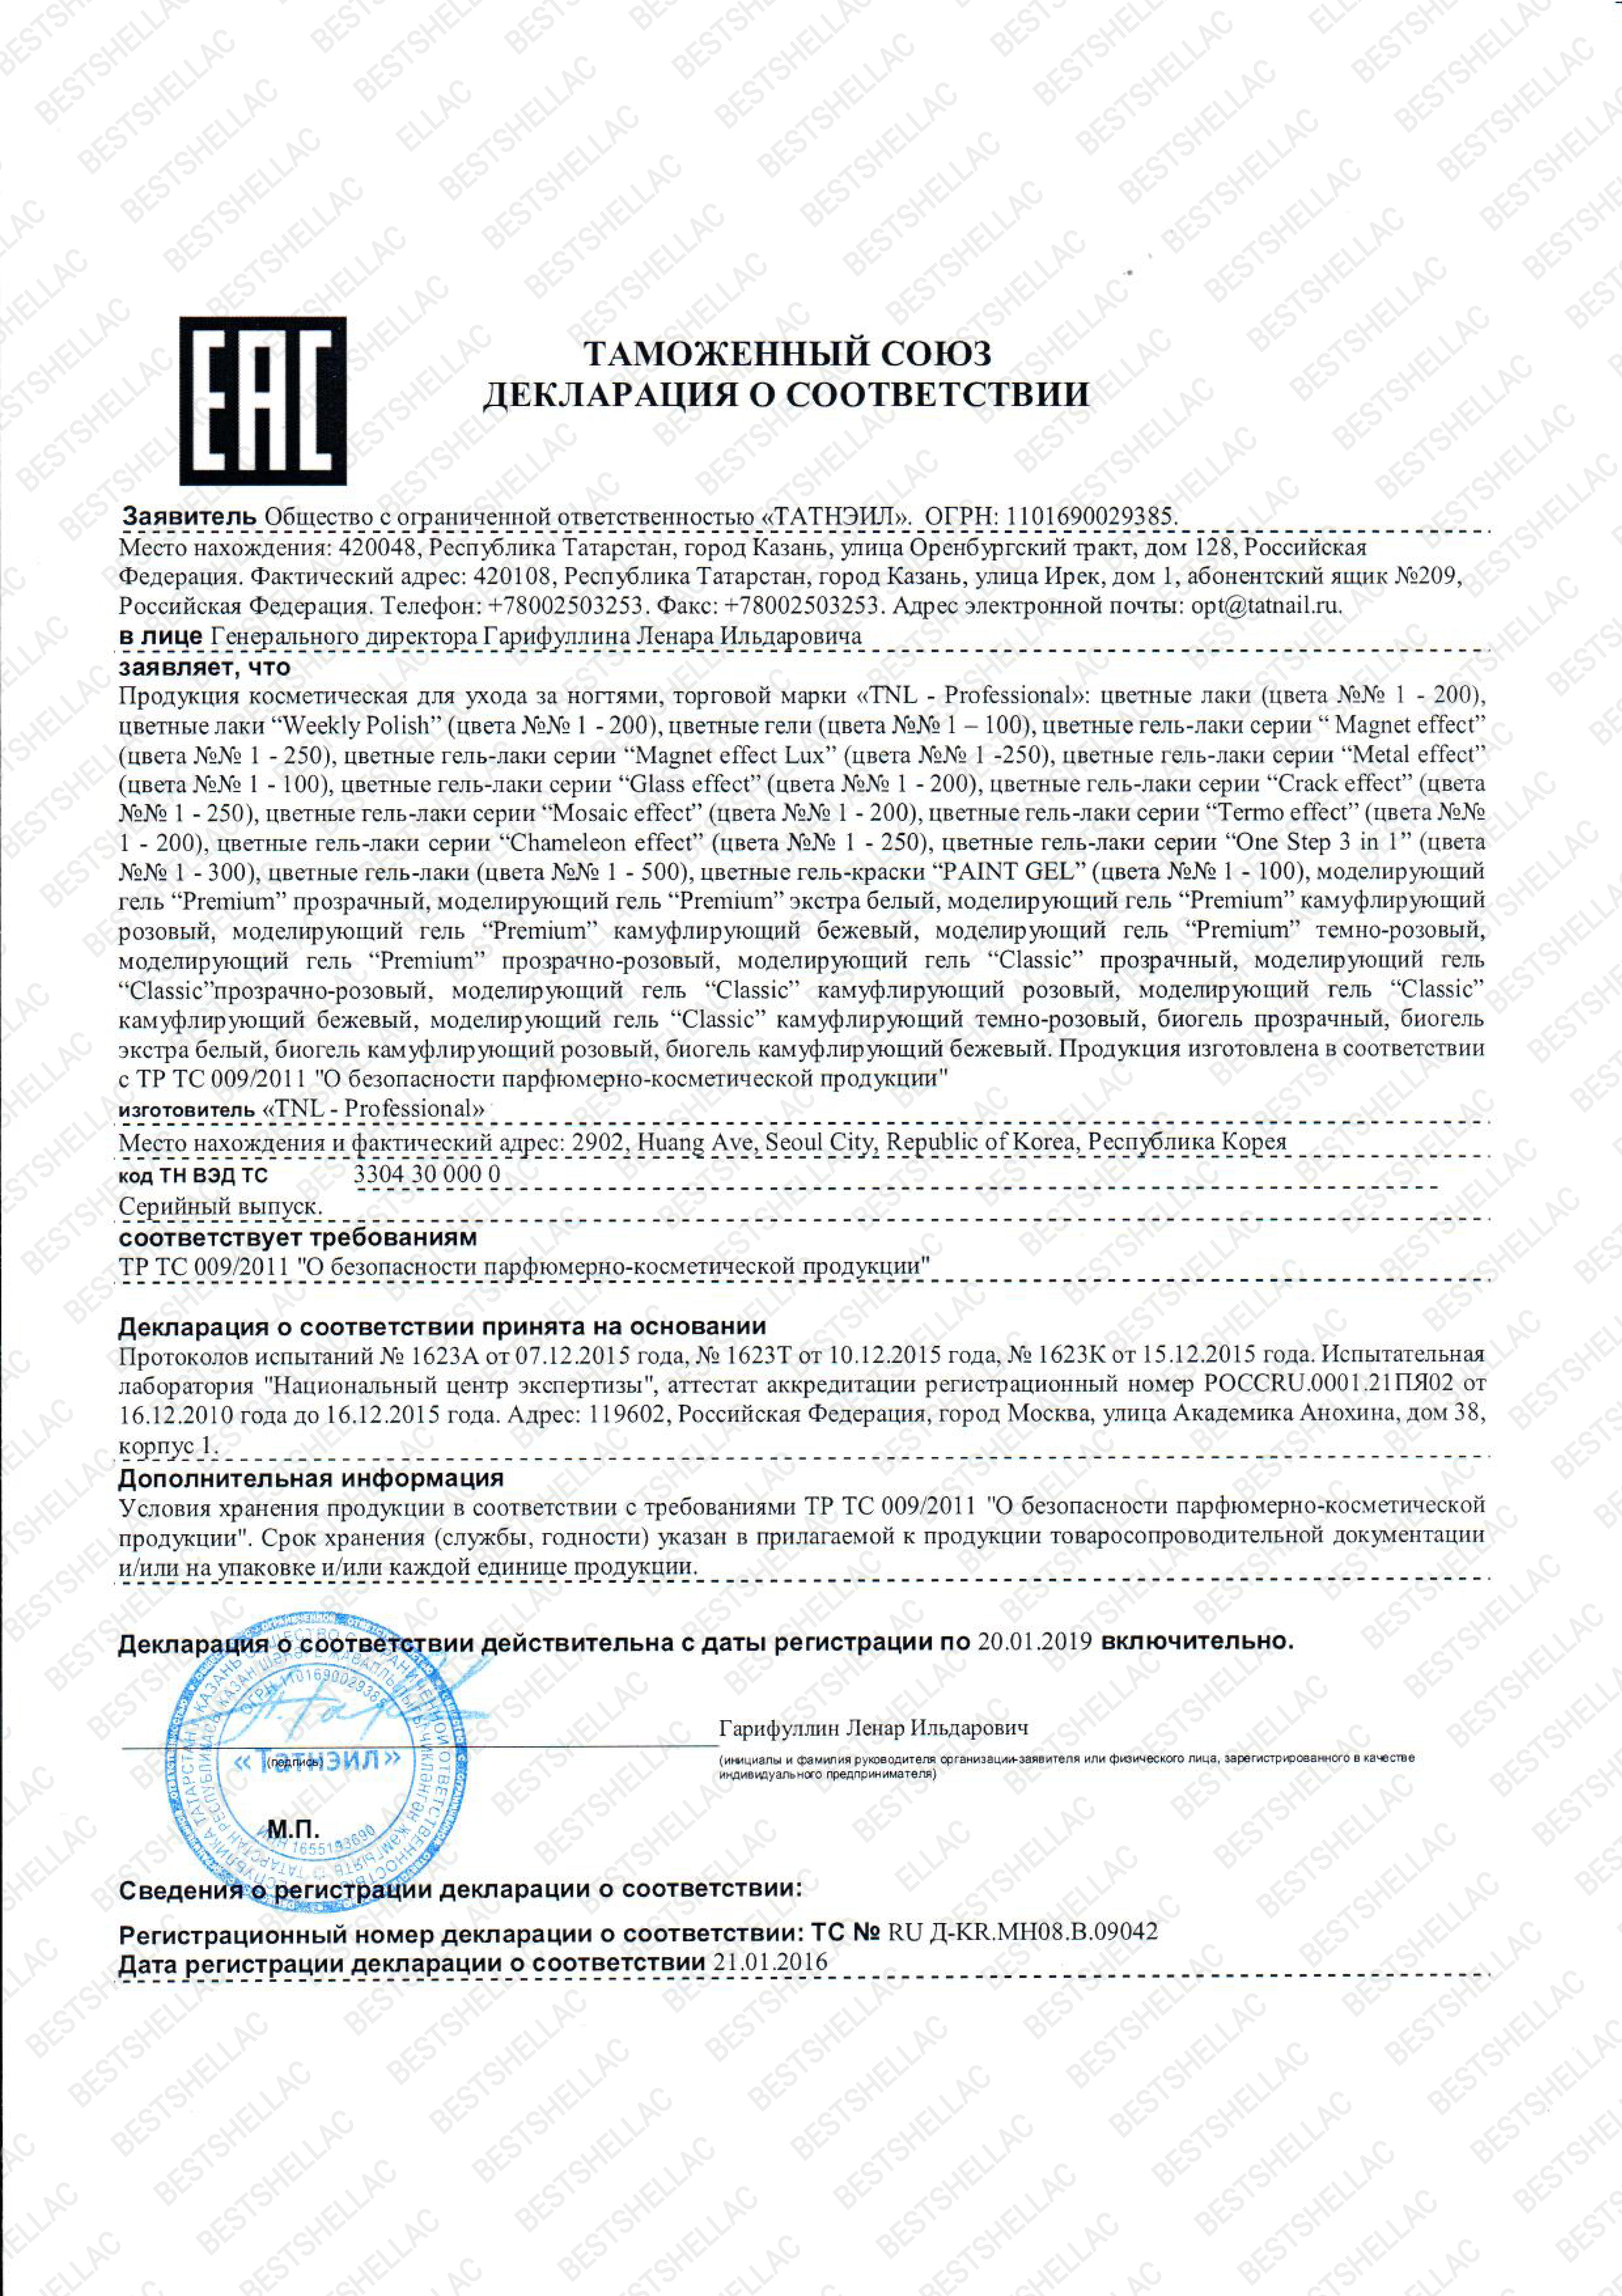 1._сертификат_ТНЛ-вода.jpg